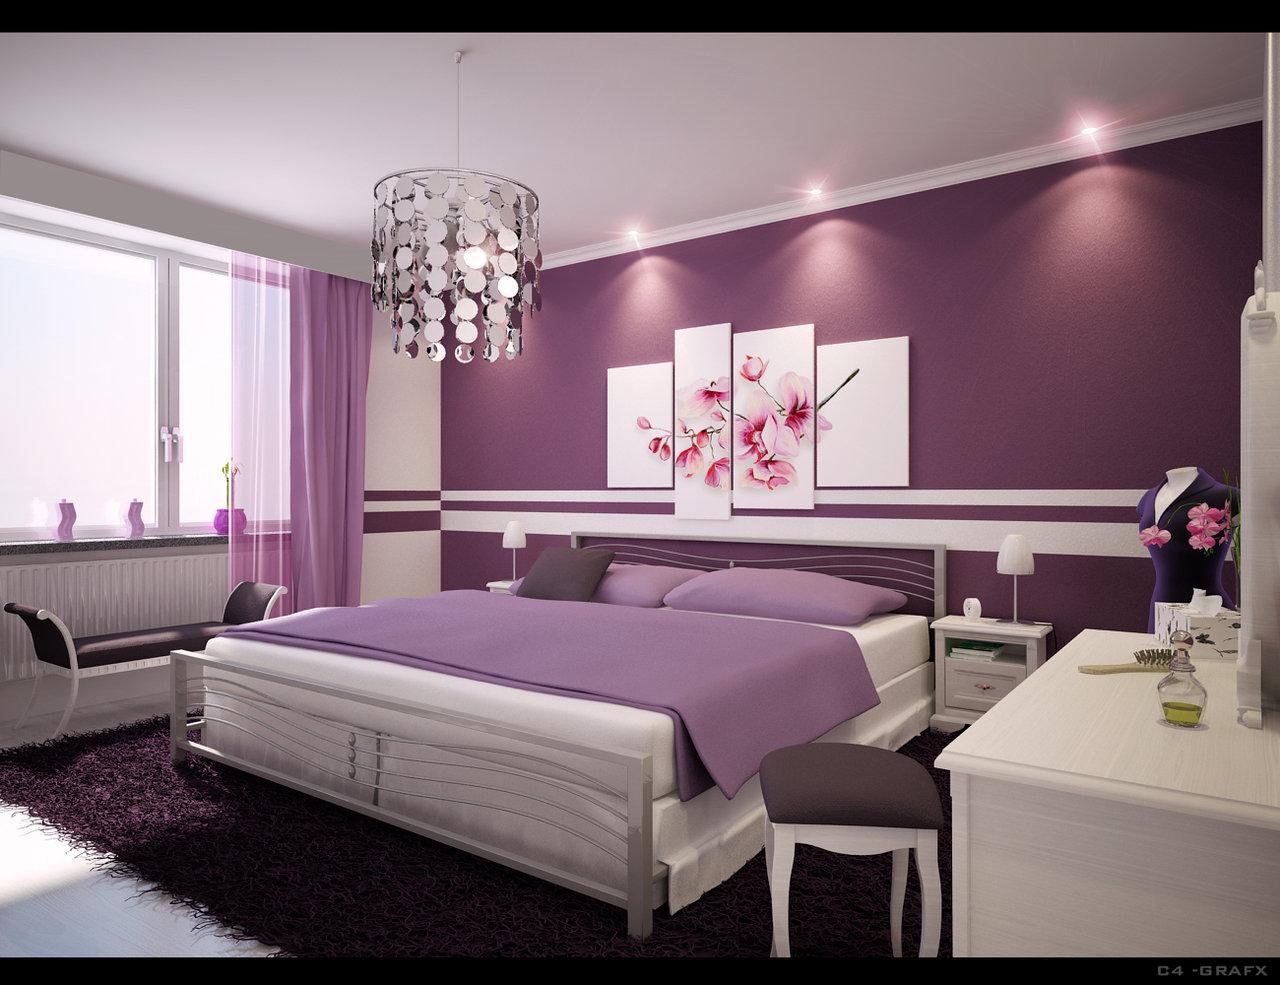 Home Interior Designs: Simple Ideas For Purple Room Design